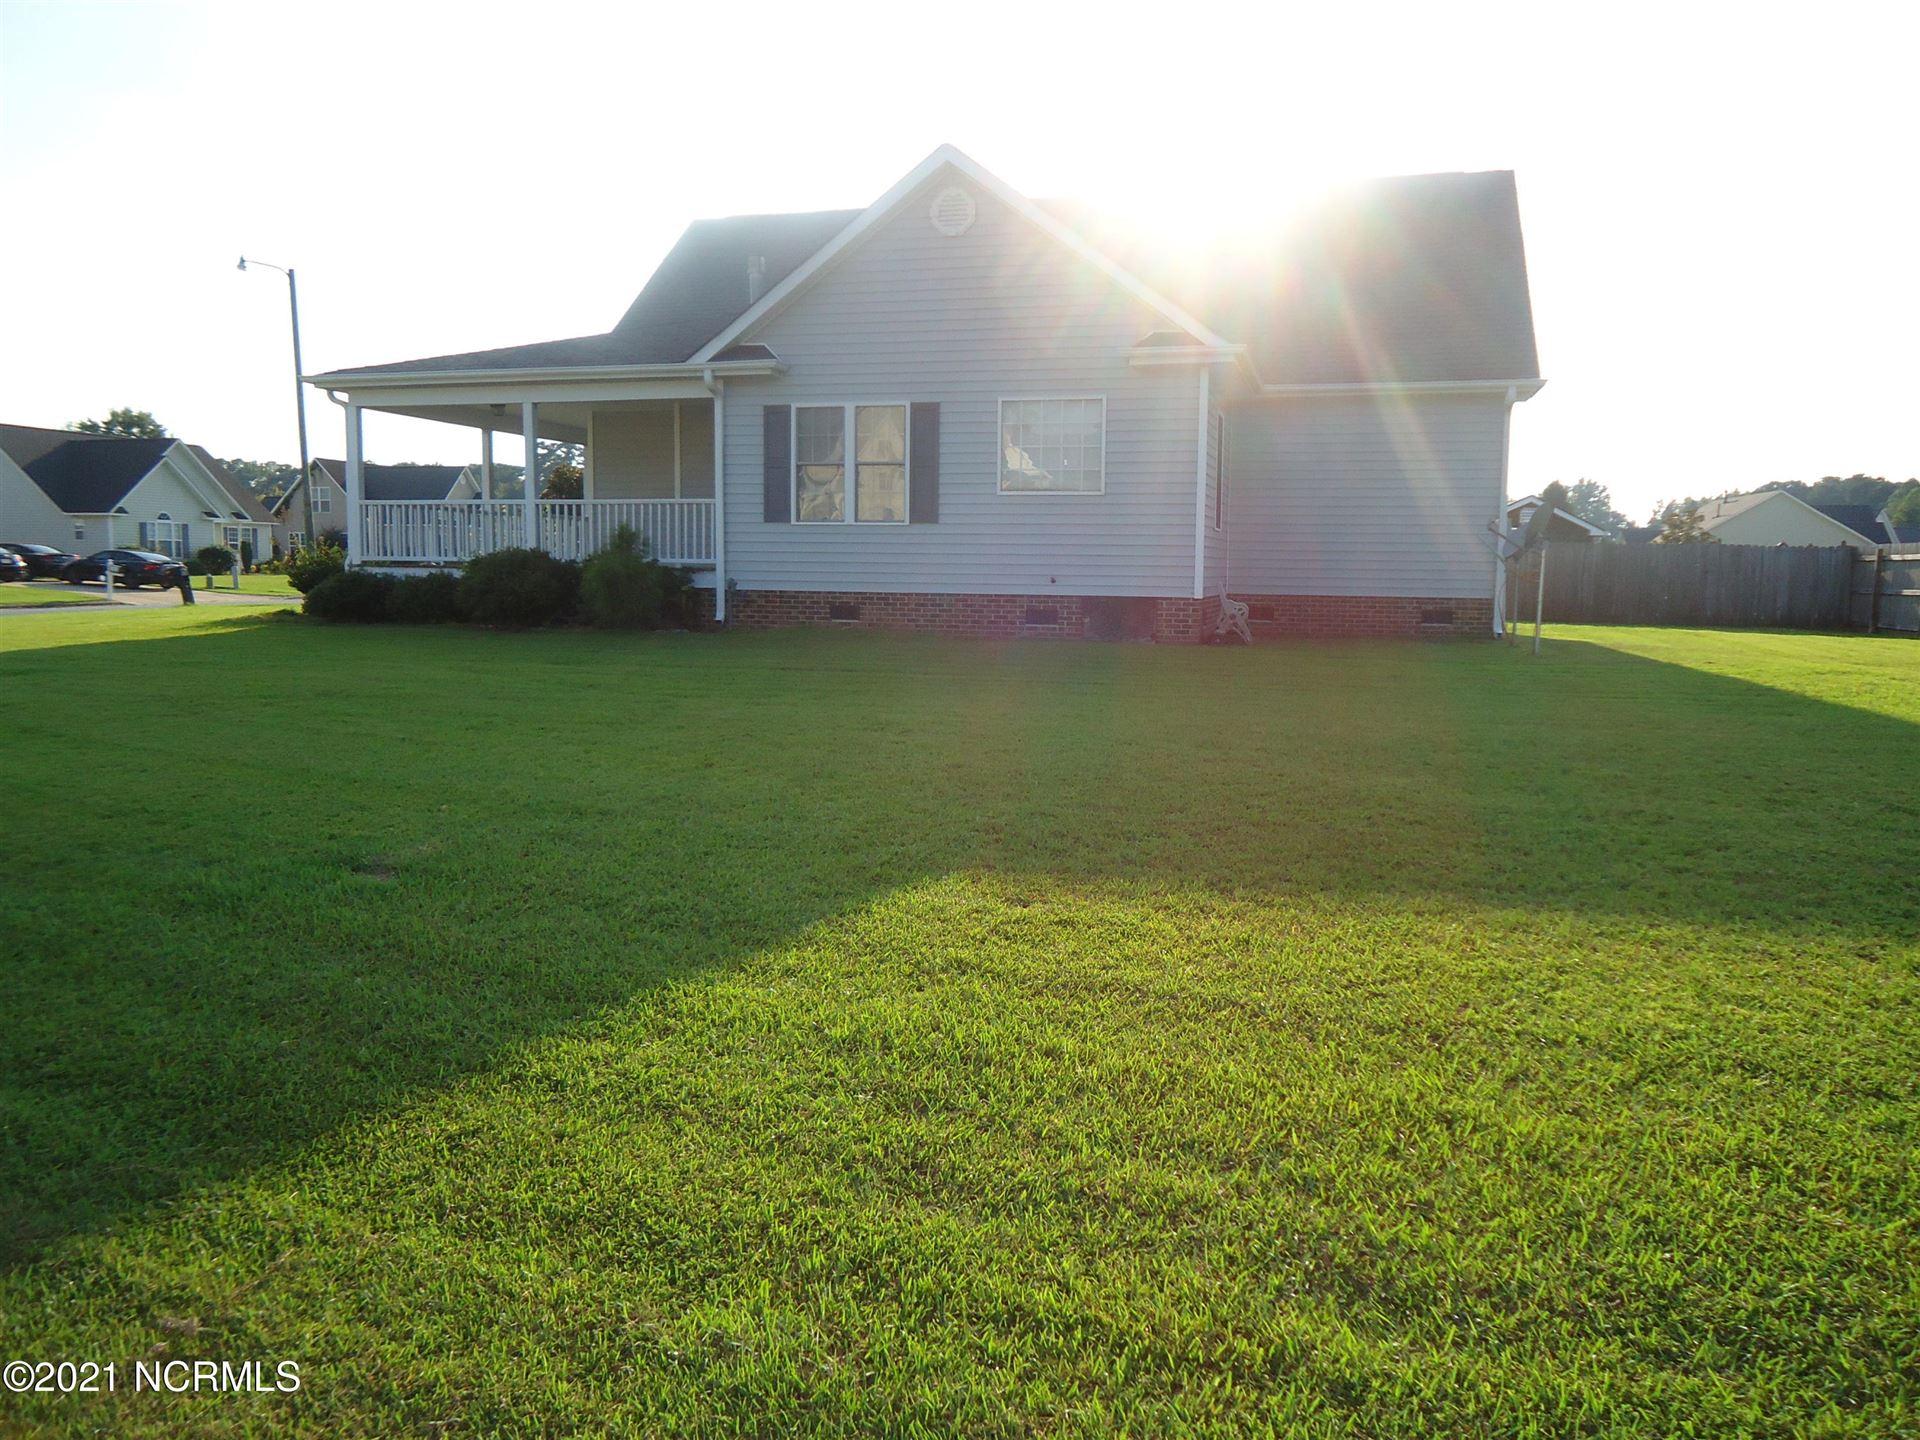 Photo of 1541 Ashmoor Lane, Winterville, NC 28590 (MLS # 100287171)